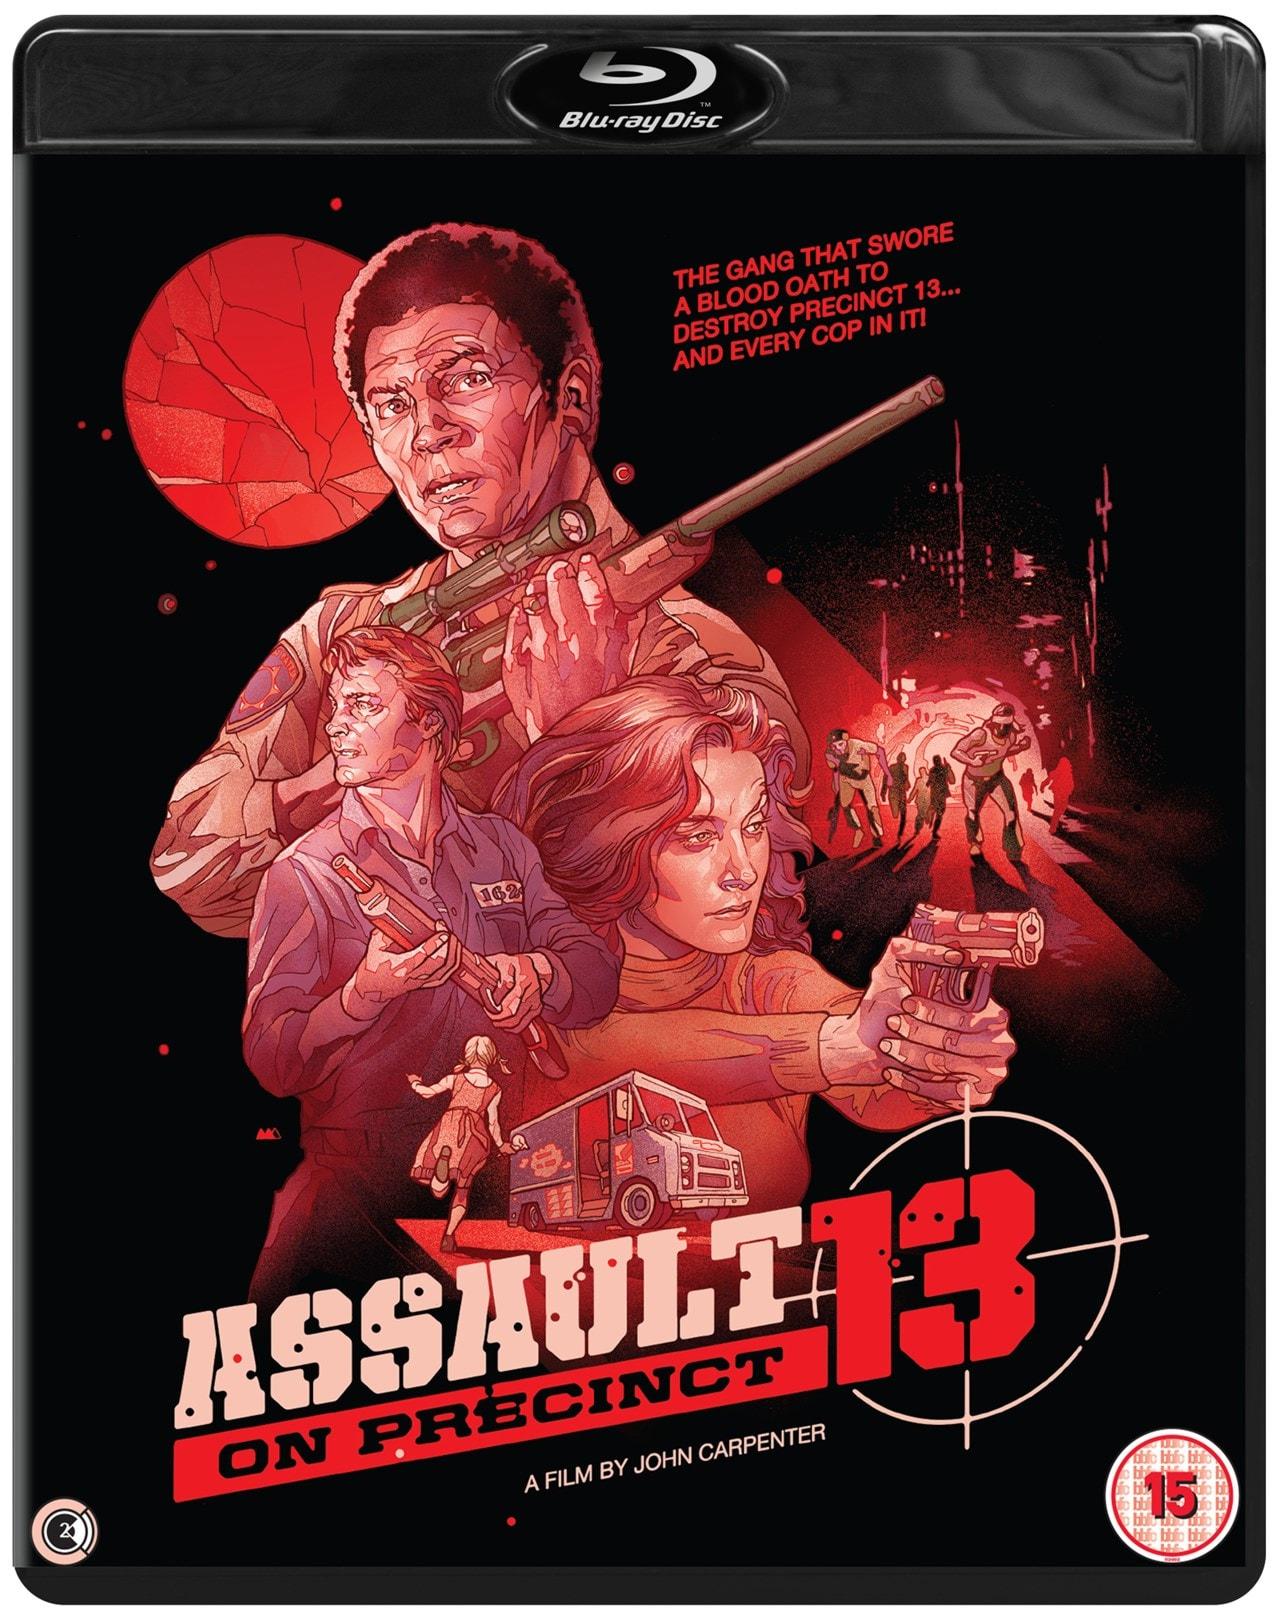 Assault On Precinct 13 - 1